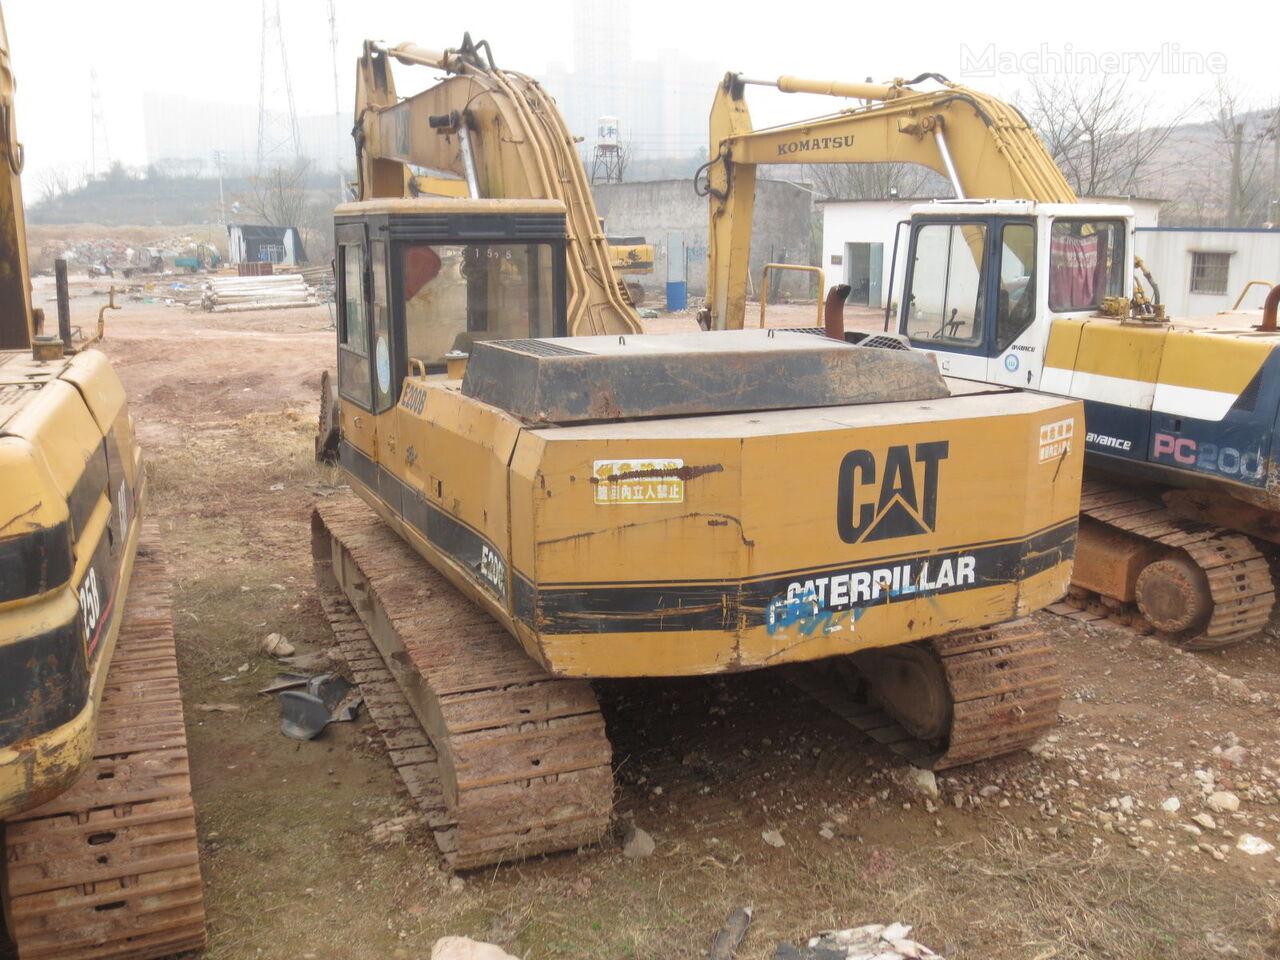 CATERPILLAR E200B EL200B excavadora de orugas